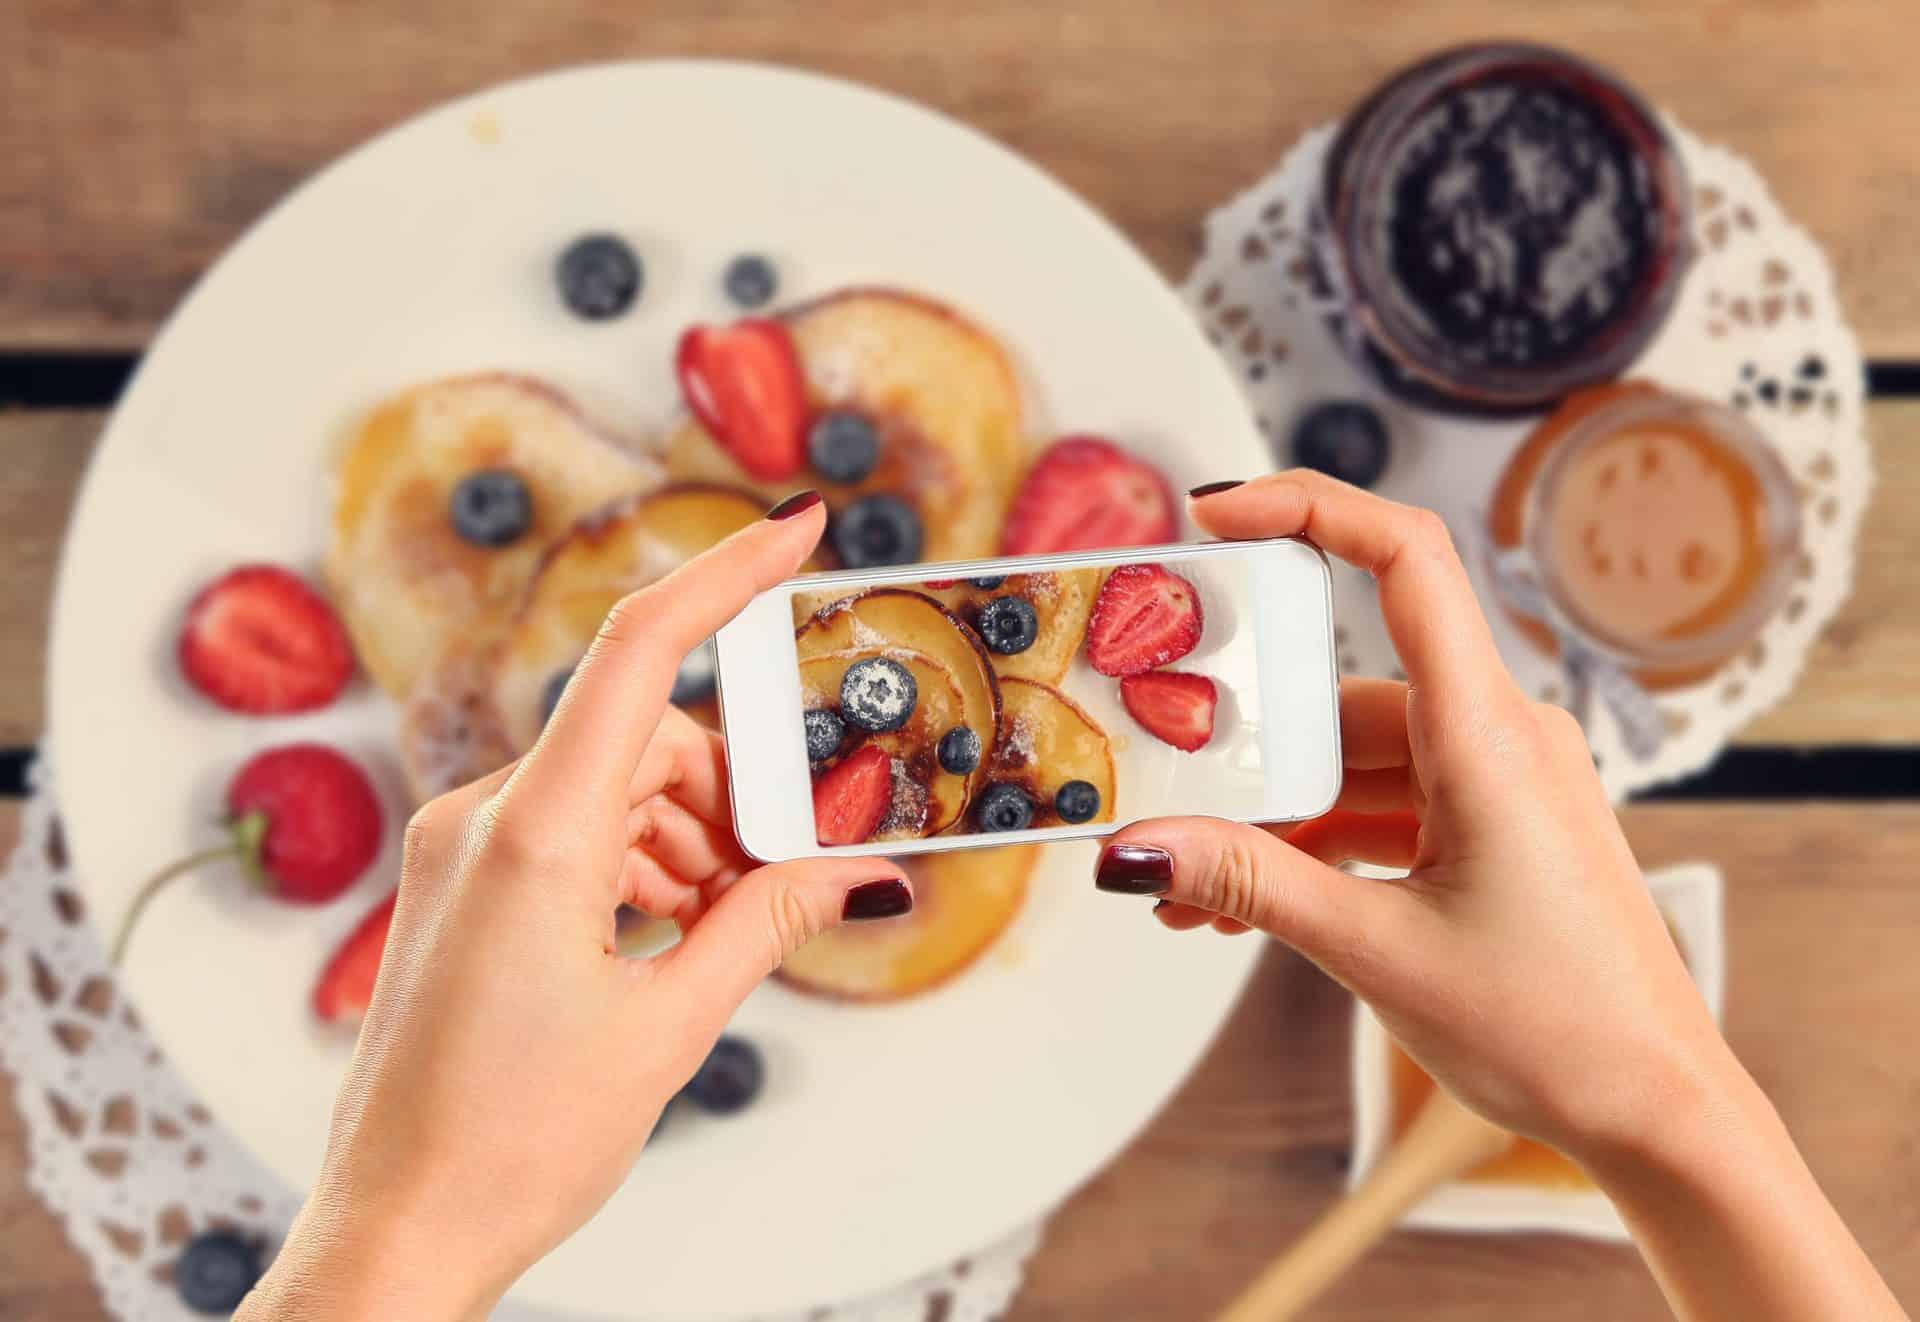 Optimized Instagram Photo of Pancakes